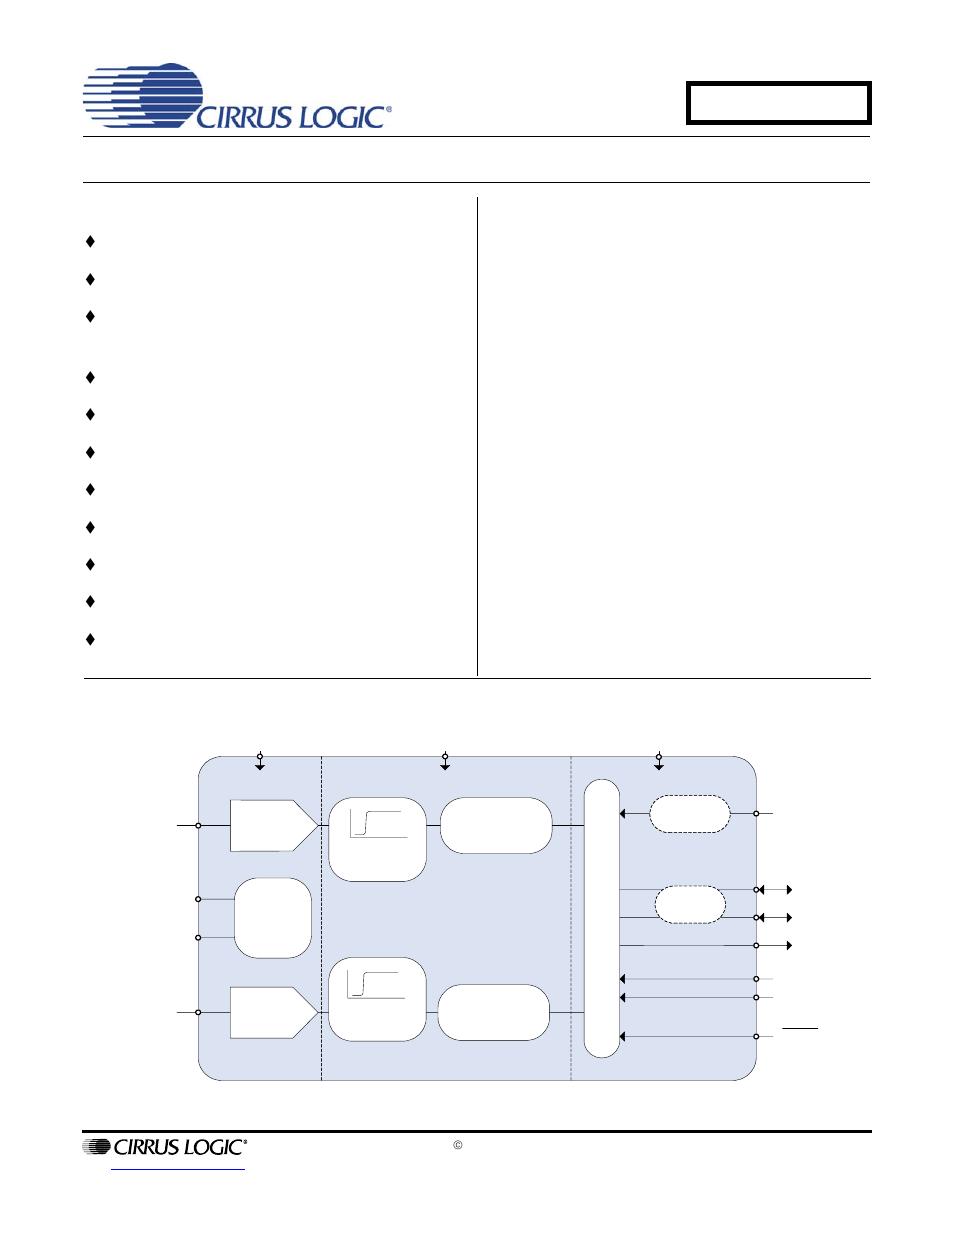 Staubli cs8c manual ebook oklahoma drivers license restriction codes array palfinger manuals ebook rh palfinger manuals ebook argodata us fandeluxe Images